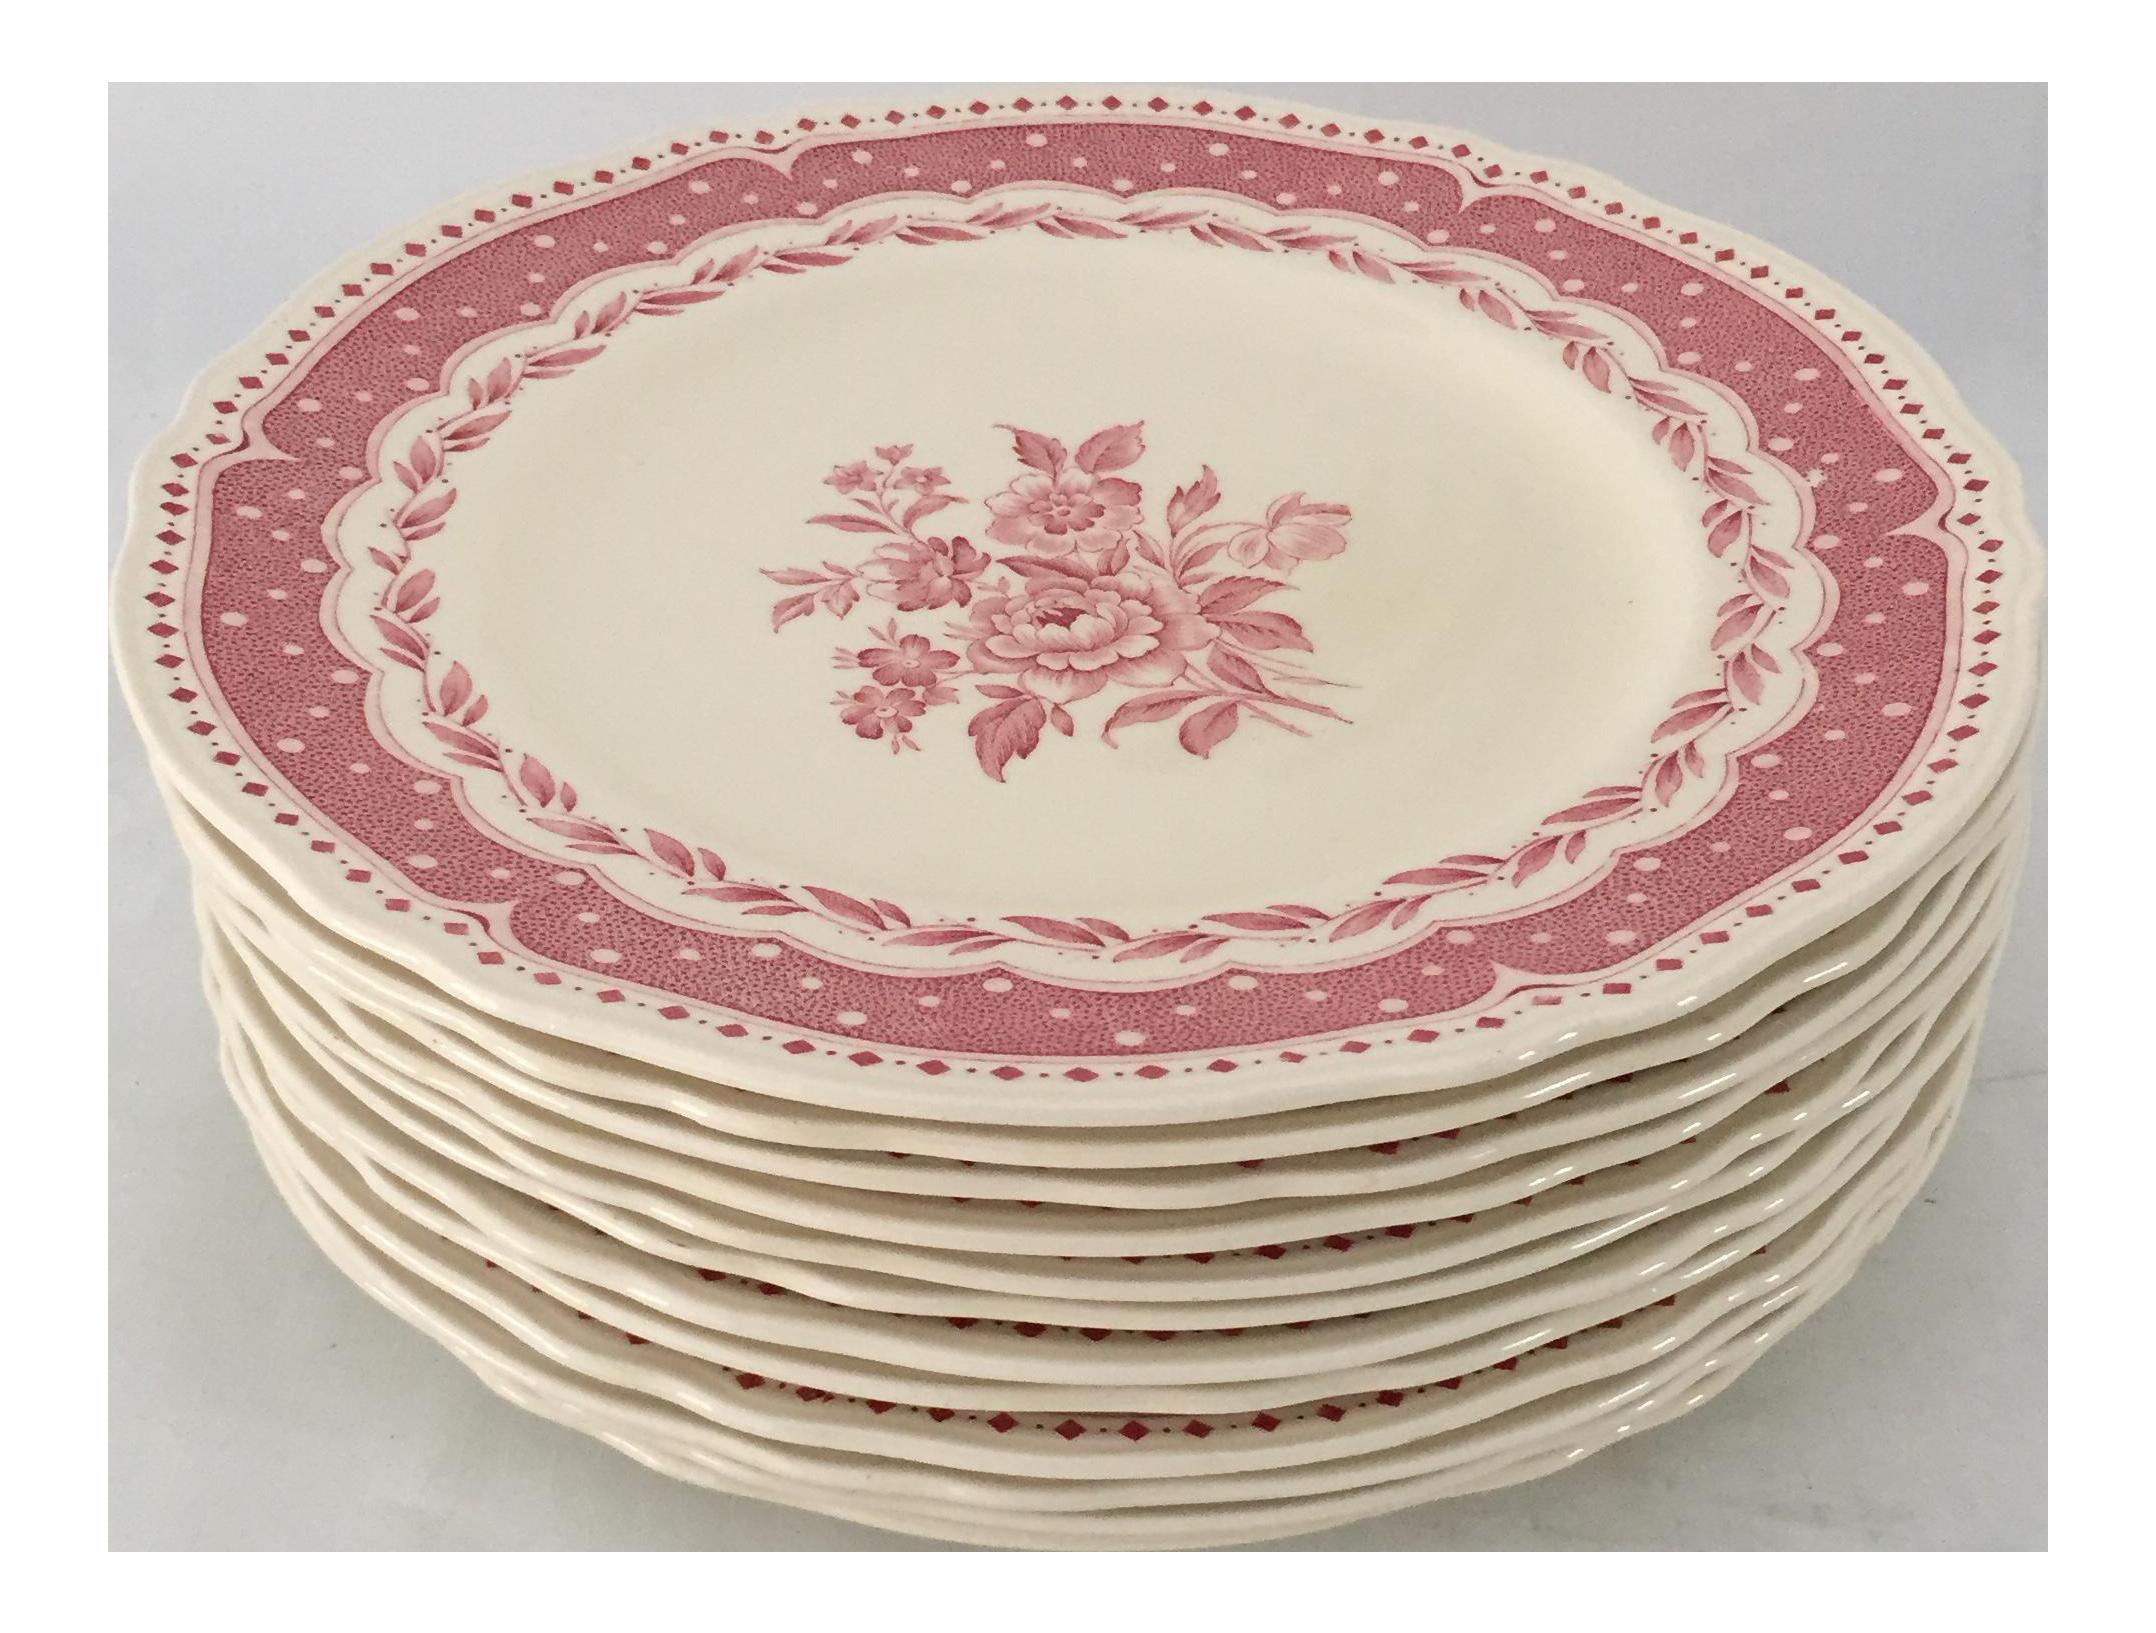 Vintage Avon Pattern Grindley-England Dinner Plates - Set of 12  sc 1 st  Chairish & Vintage Avon Pattern Grindley-England Dinner Plates - Set of 12 ...